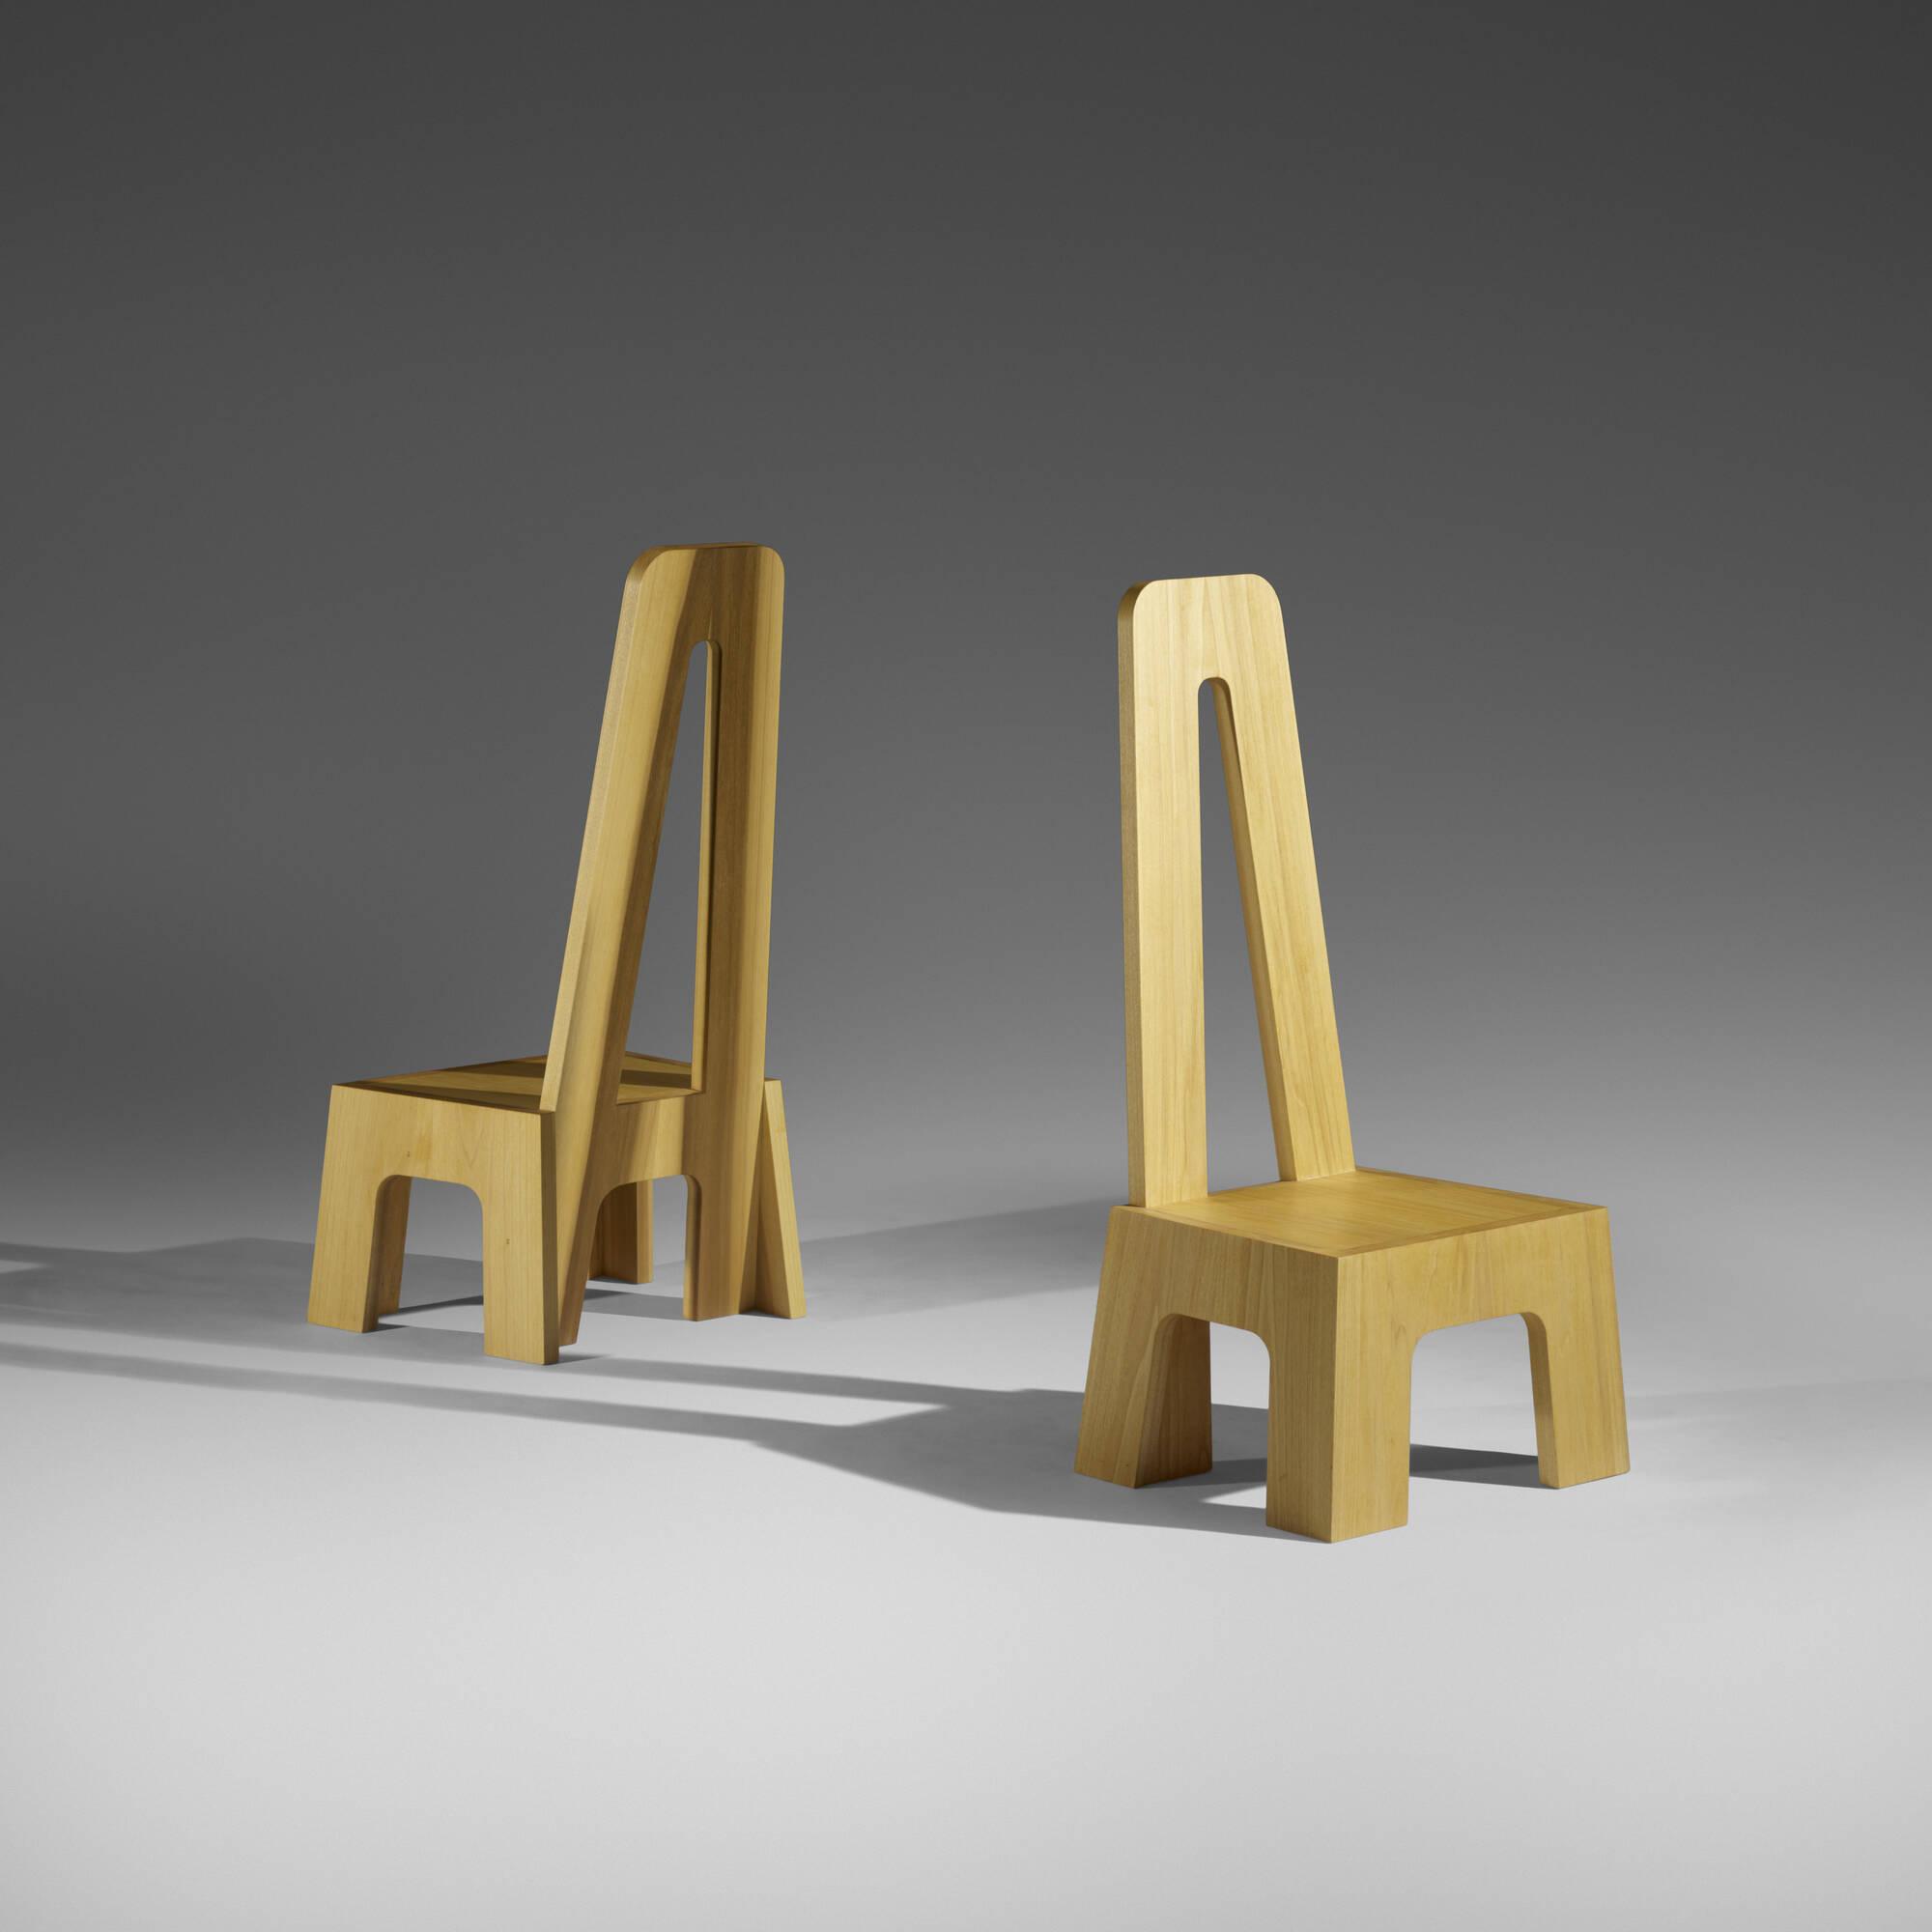 251: Richard Tuttle / Mesa chairs, pair (1 of 3)